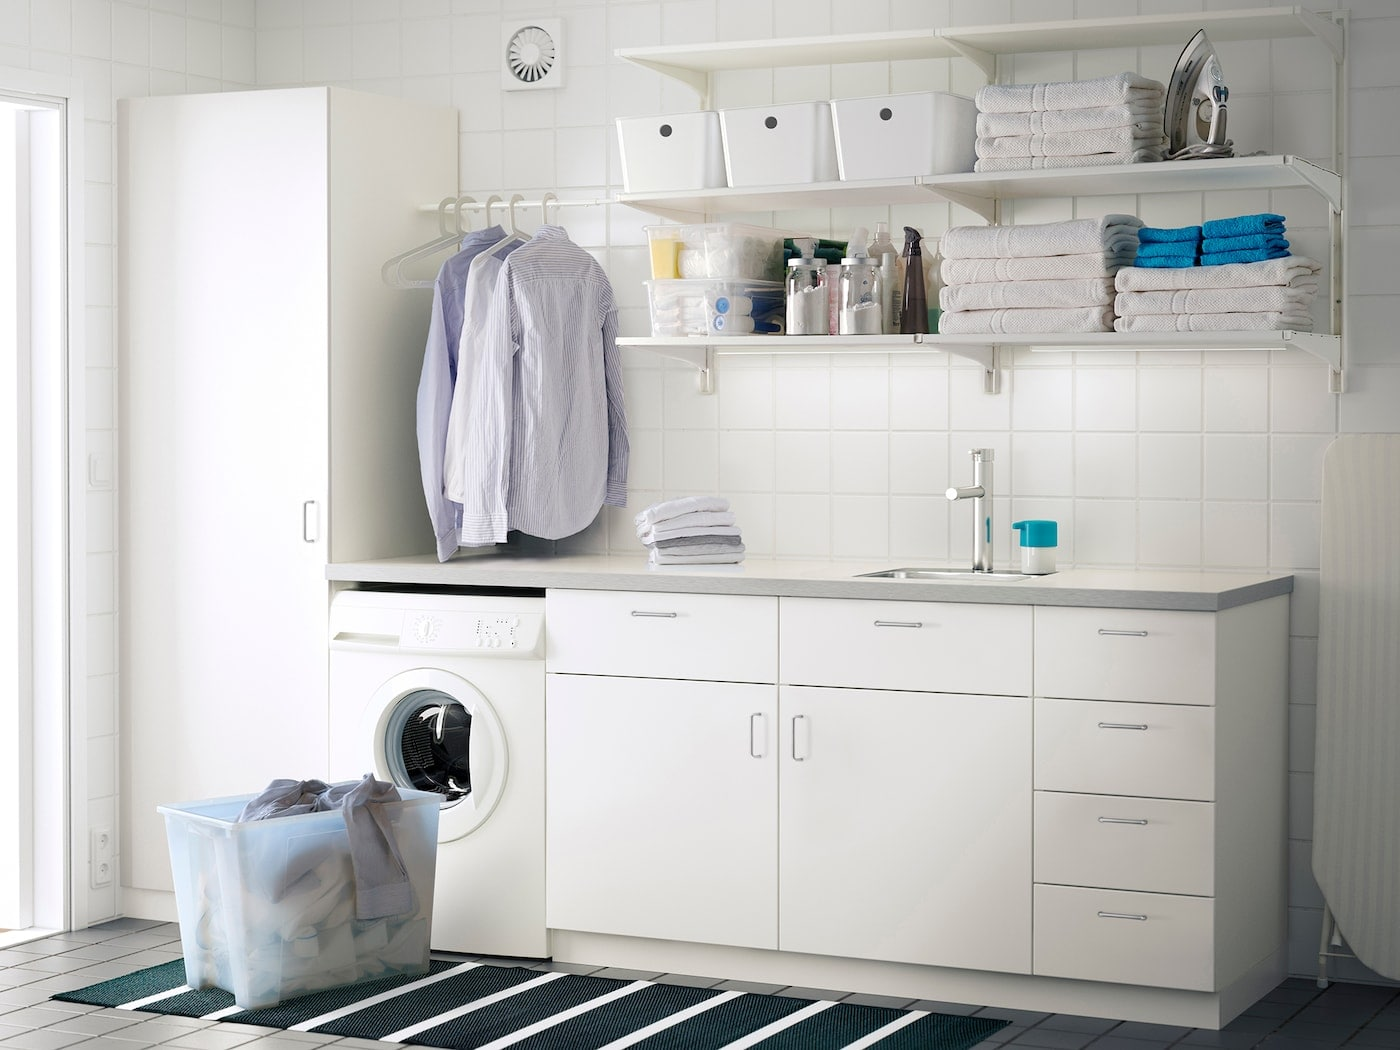 wasruimte IKEA keuken wasmachine wit ALGOT opbergsysteem